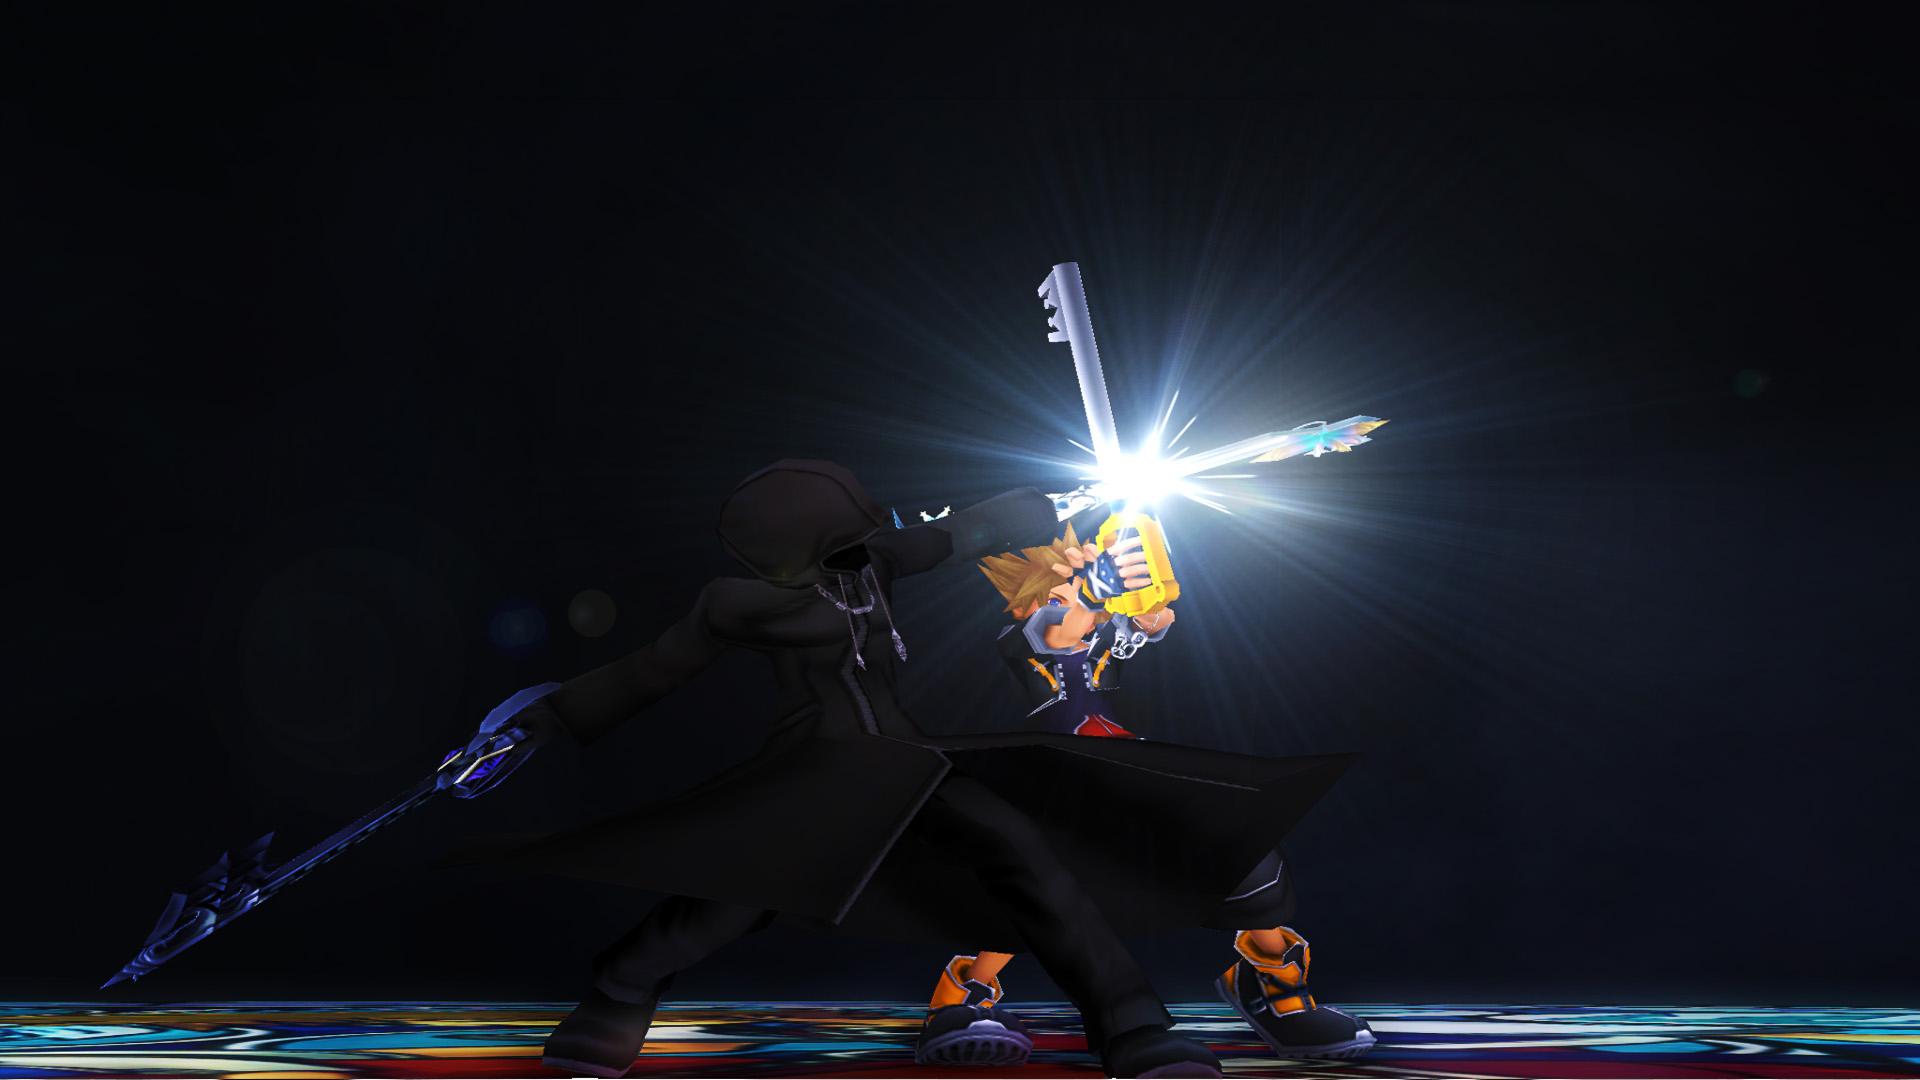 Kingdom Hearts Computer Wallpapers Desktop Backgrounds 1920x1080